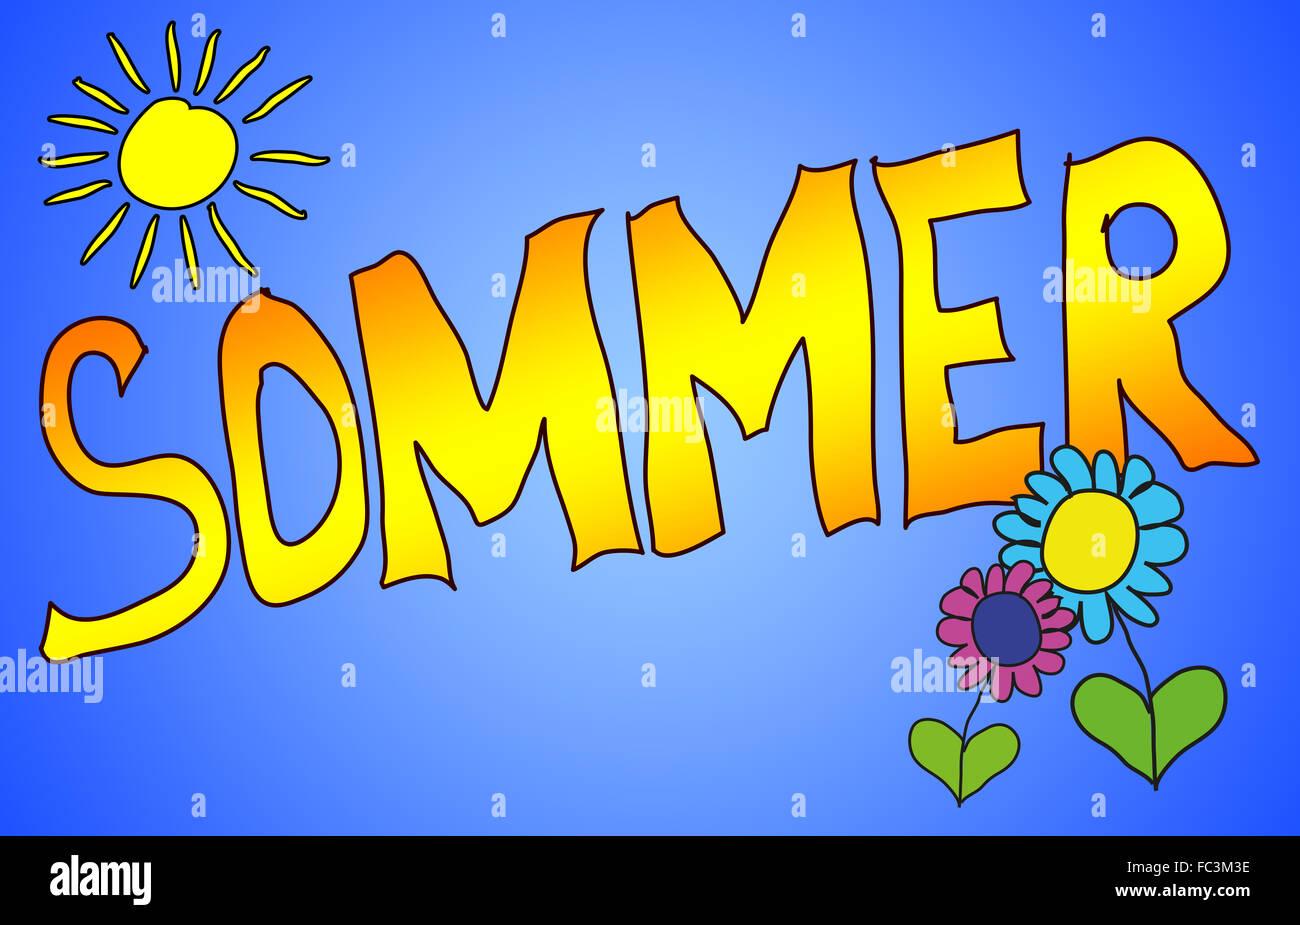 Summer - Stock Image